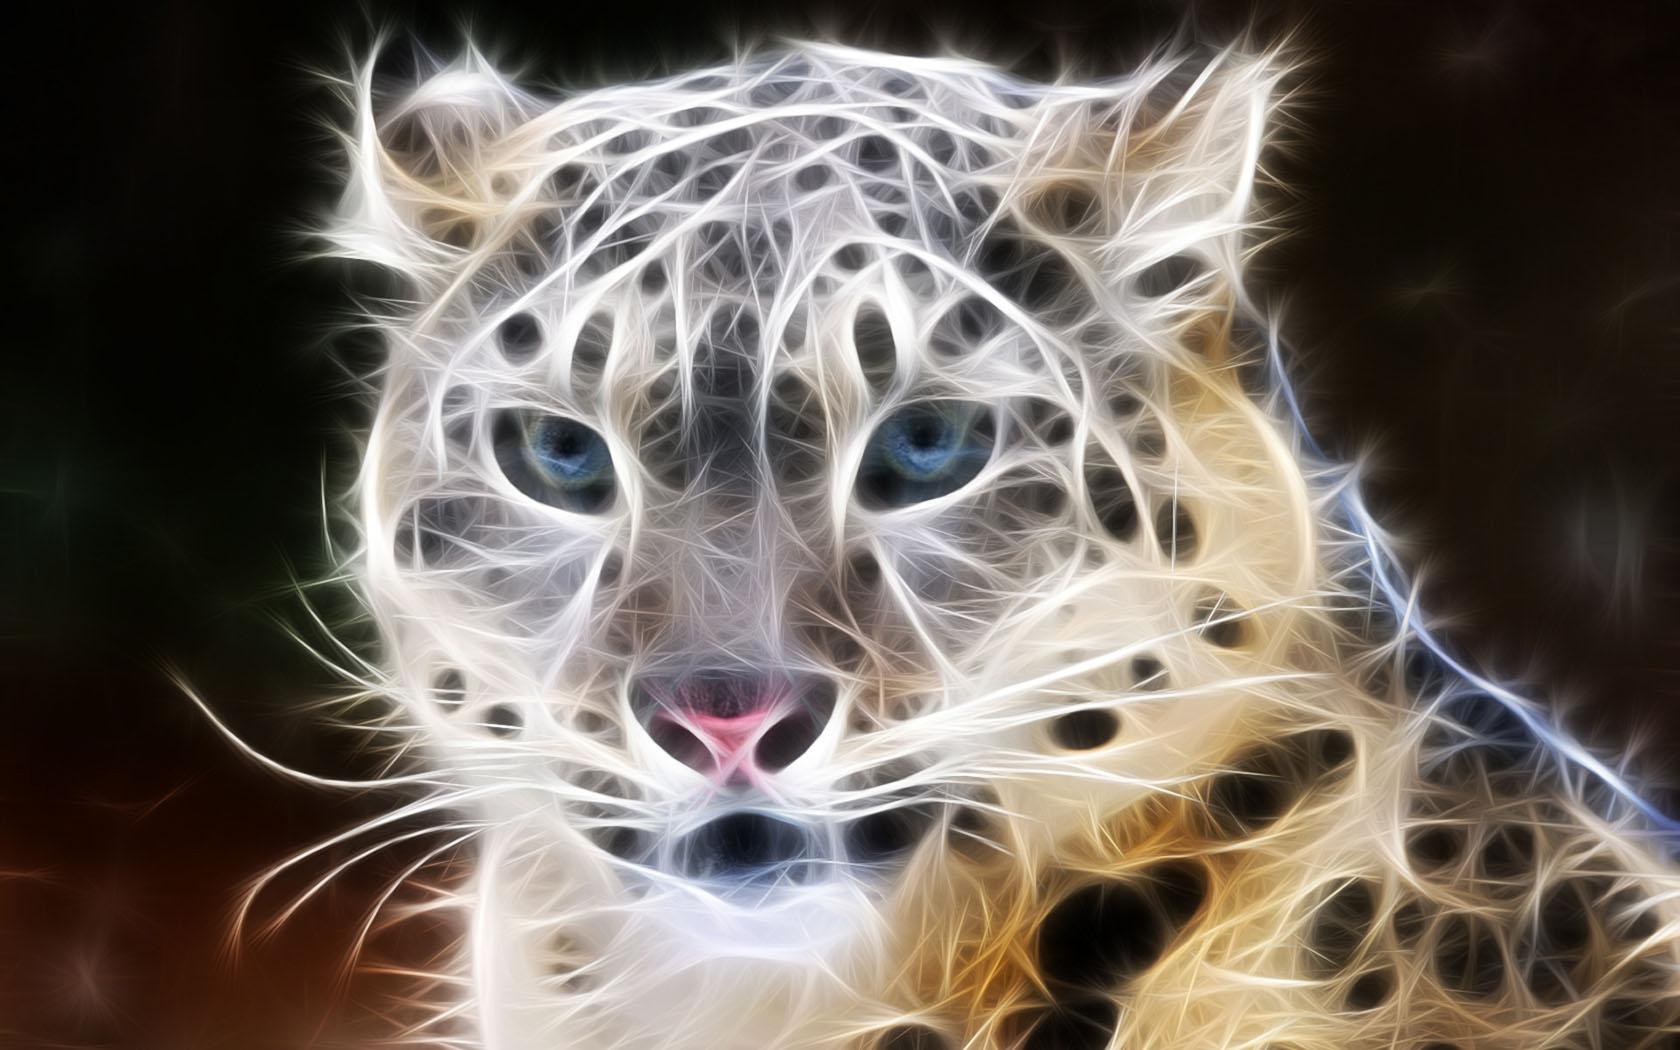 Digital Leopard Art Wallpapers: Free Download High Quality Digital Animals Wallpaper Num